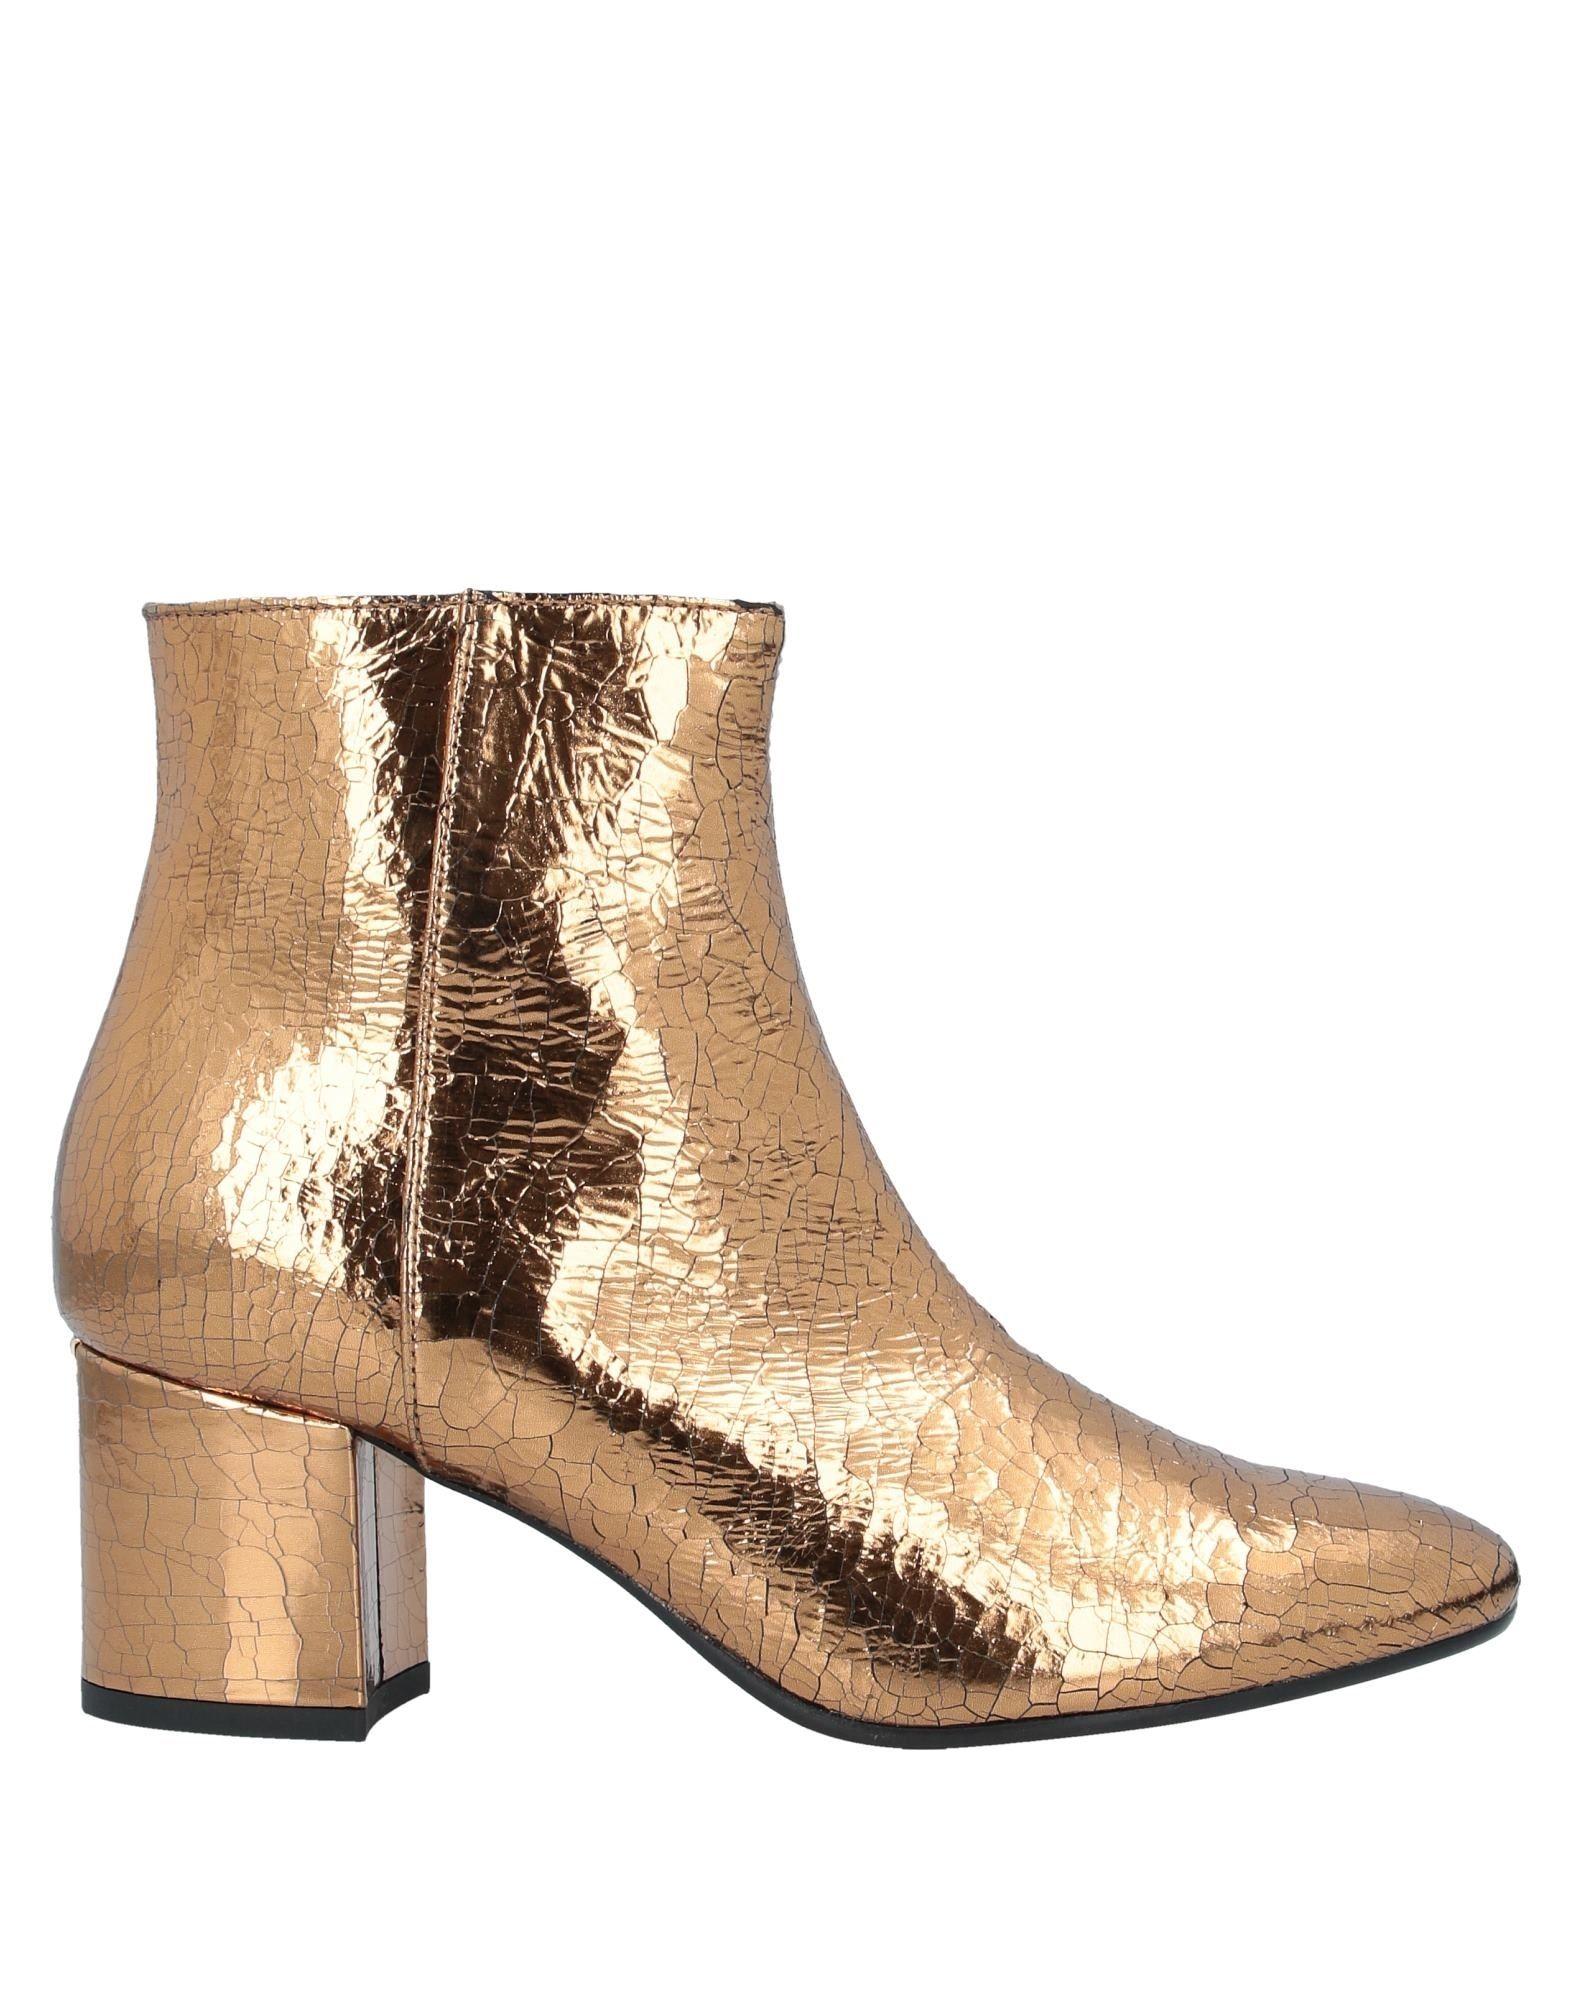 LIU •JO Полусапоги и высокие ботинки полусапоги liu jo s67231p0298 22222